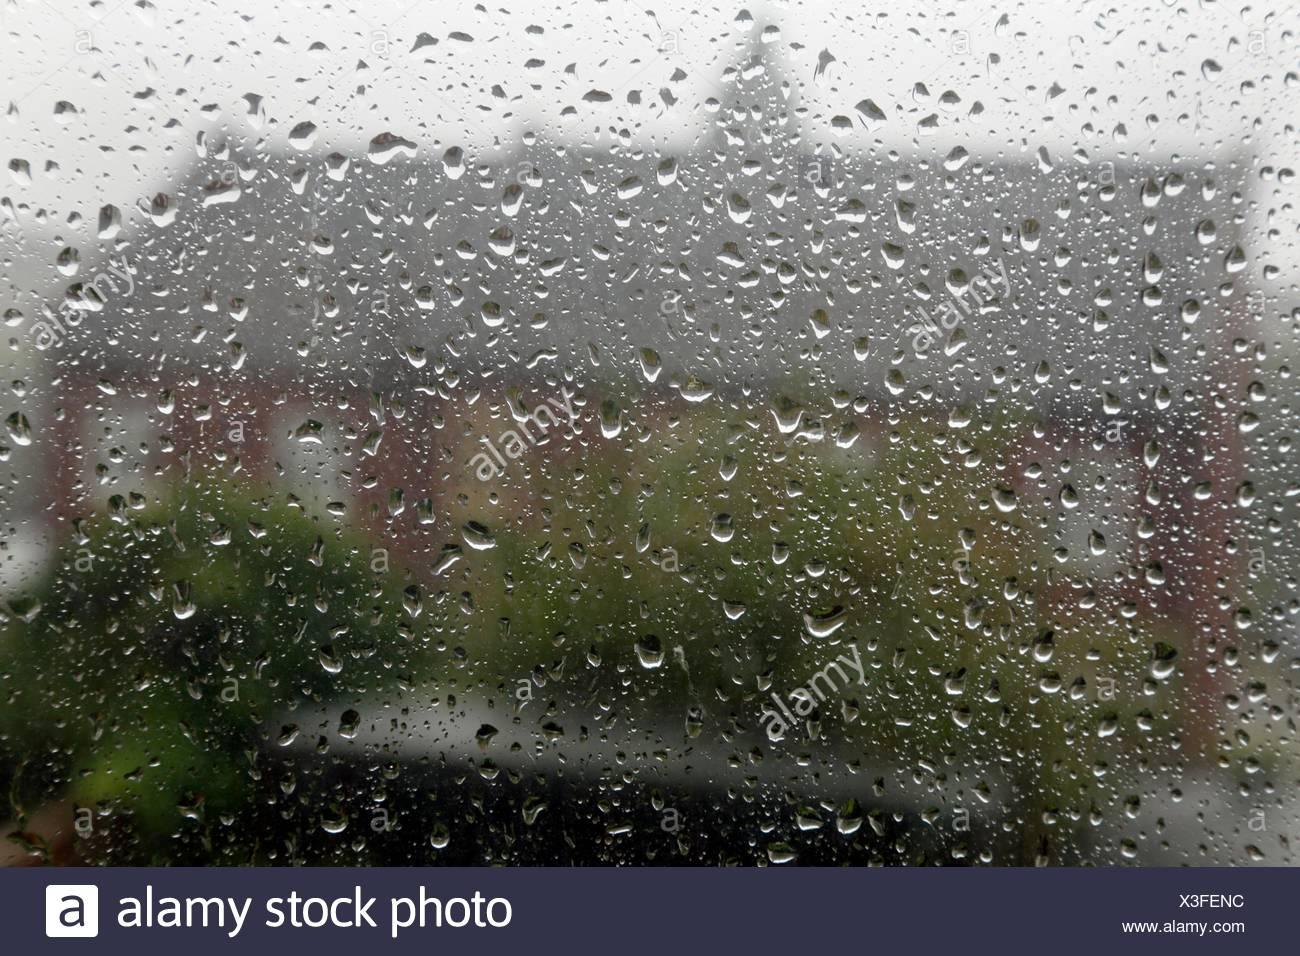 water environmental issues environment environmental rain